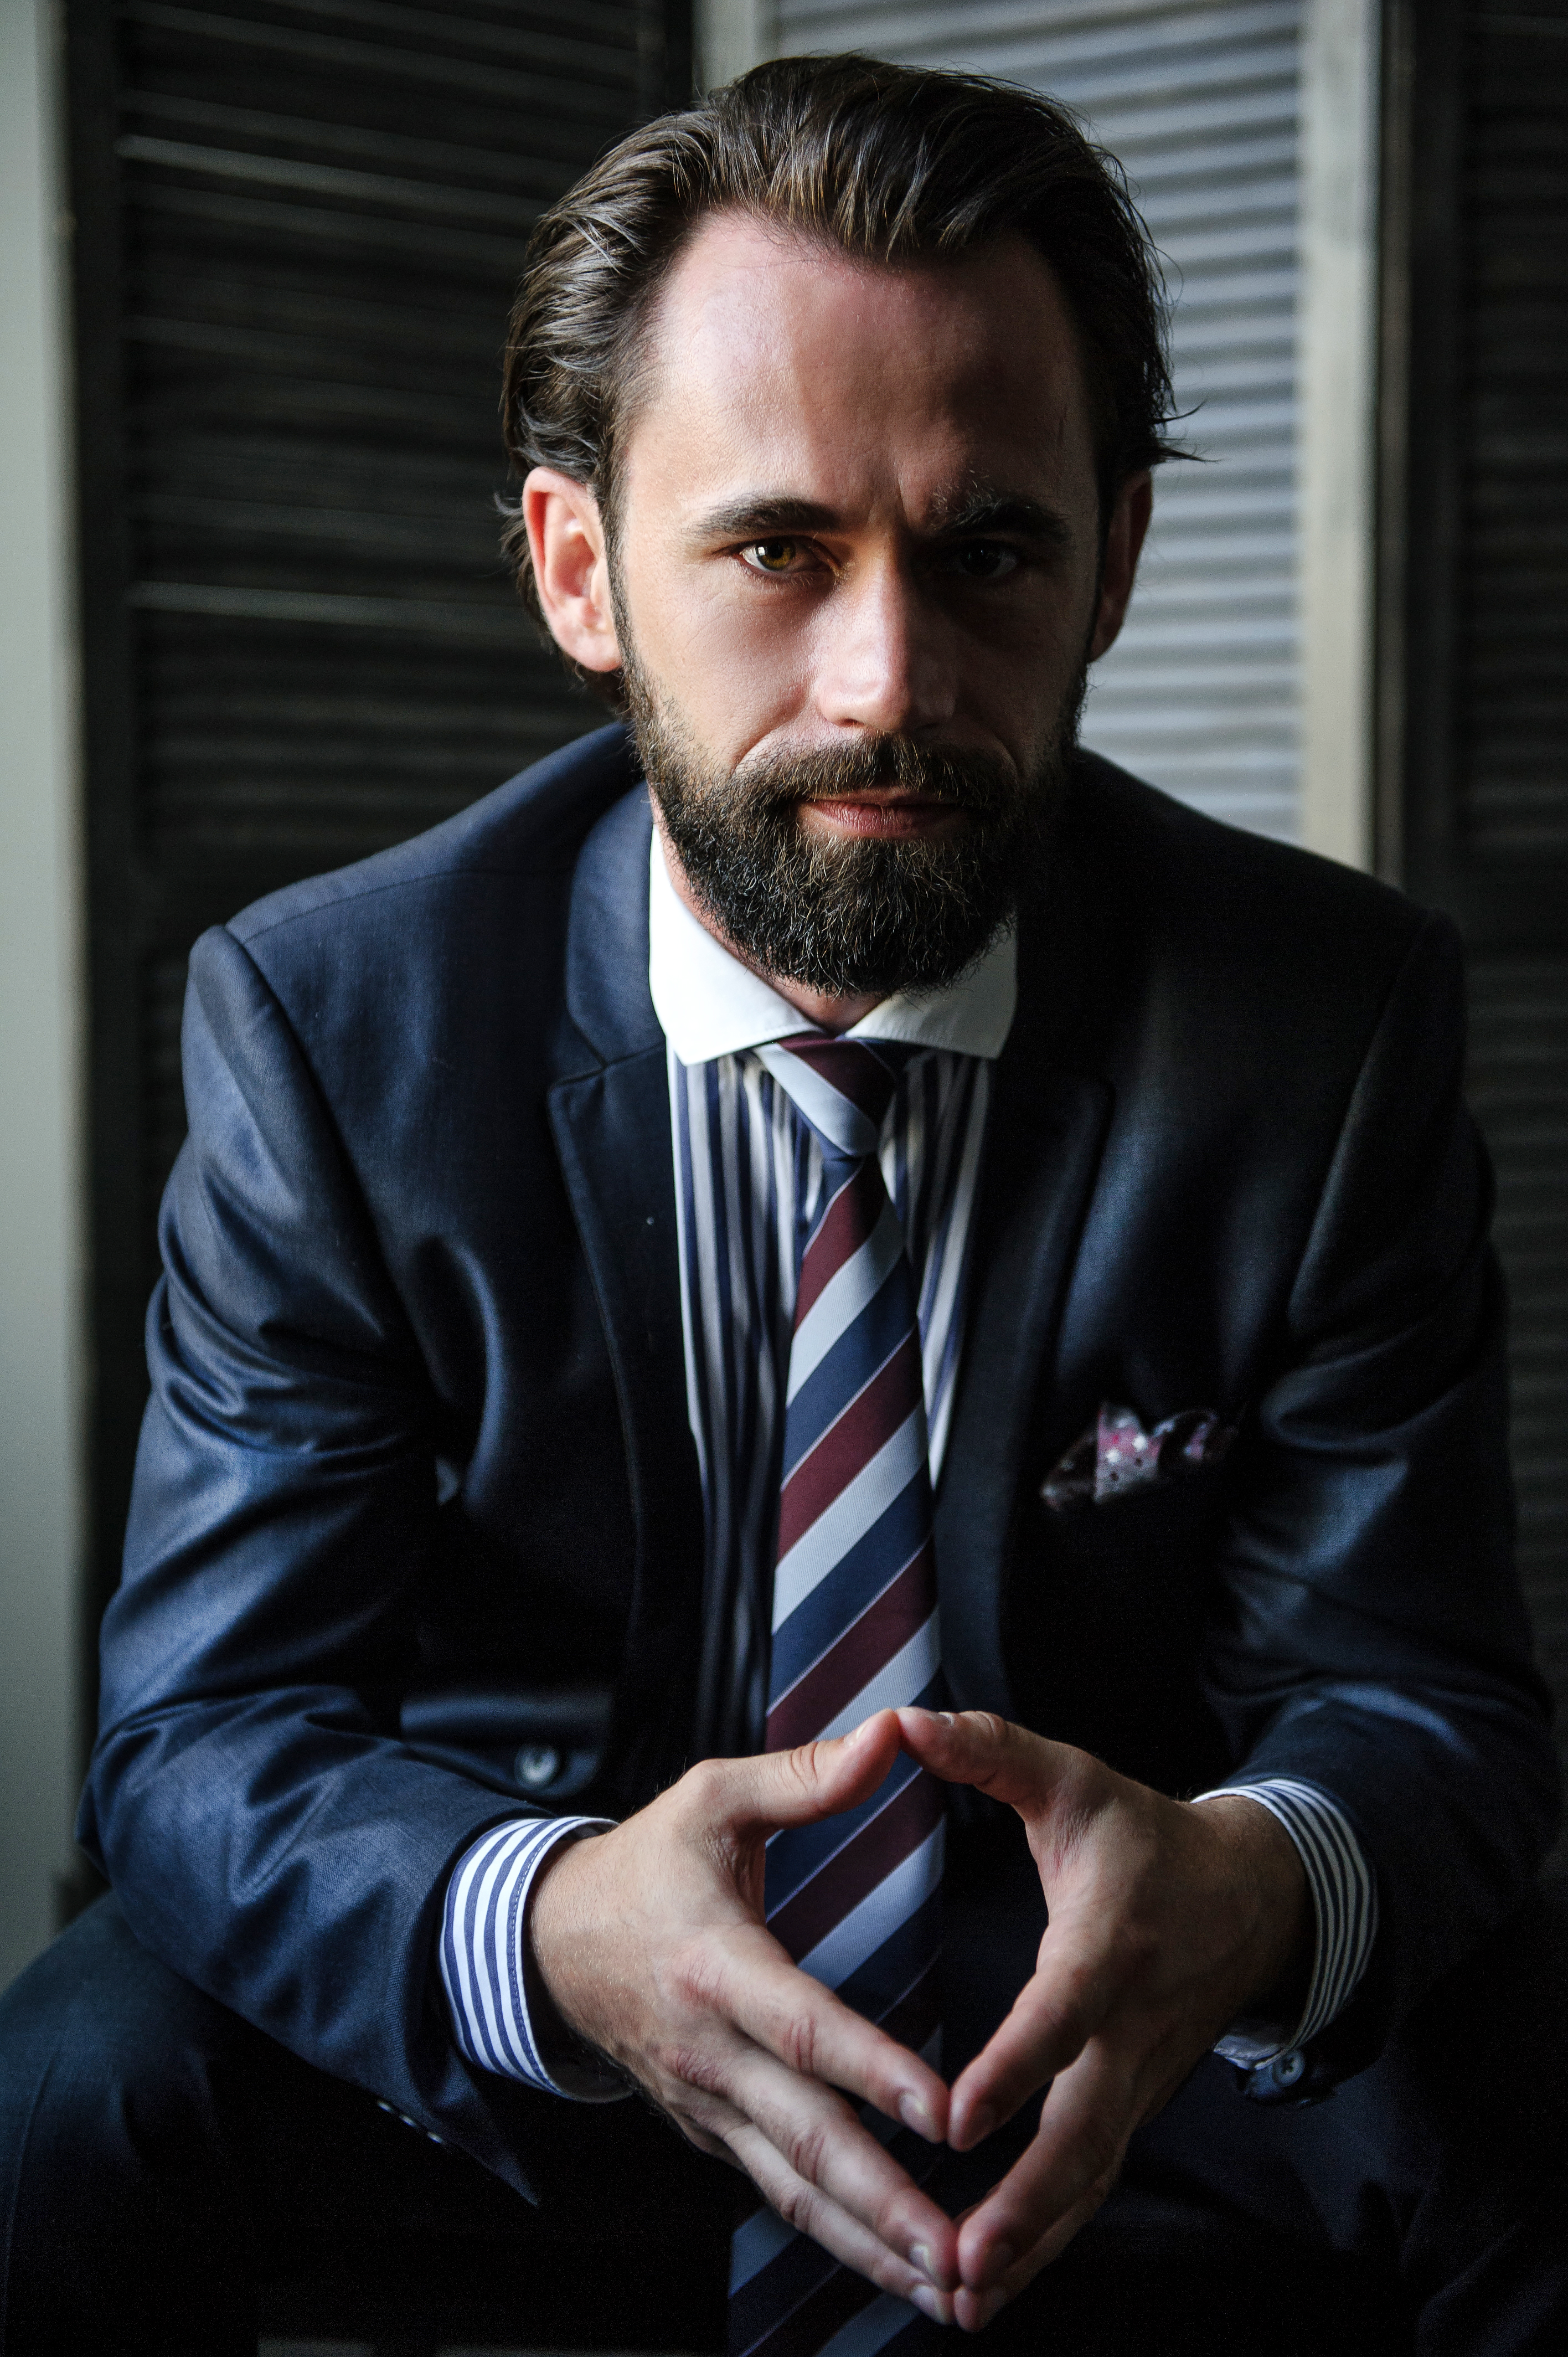 Макаровcкий Дмитрий